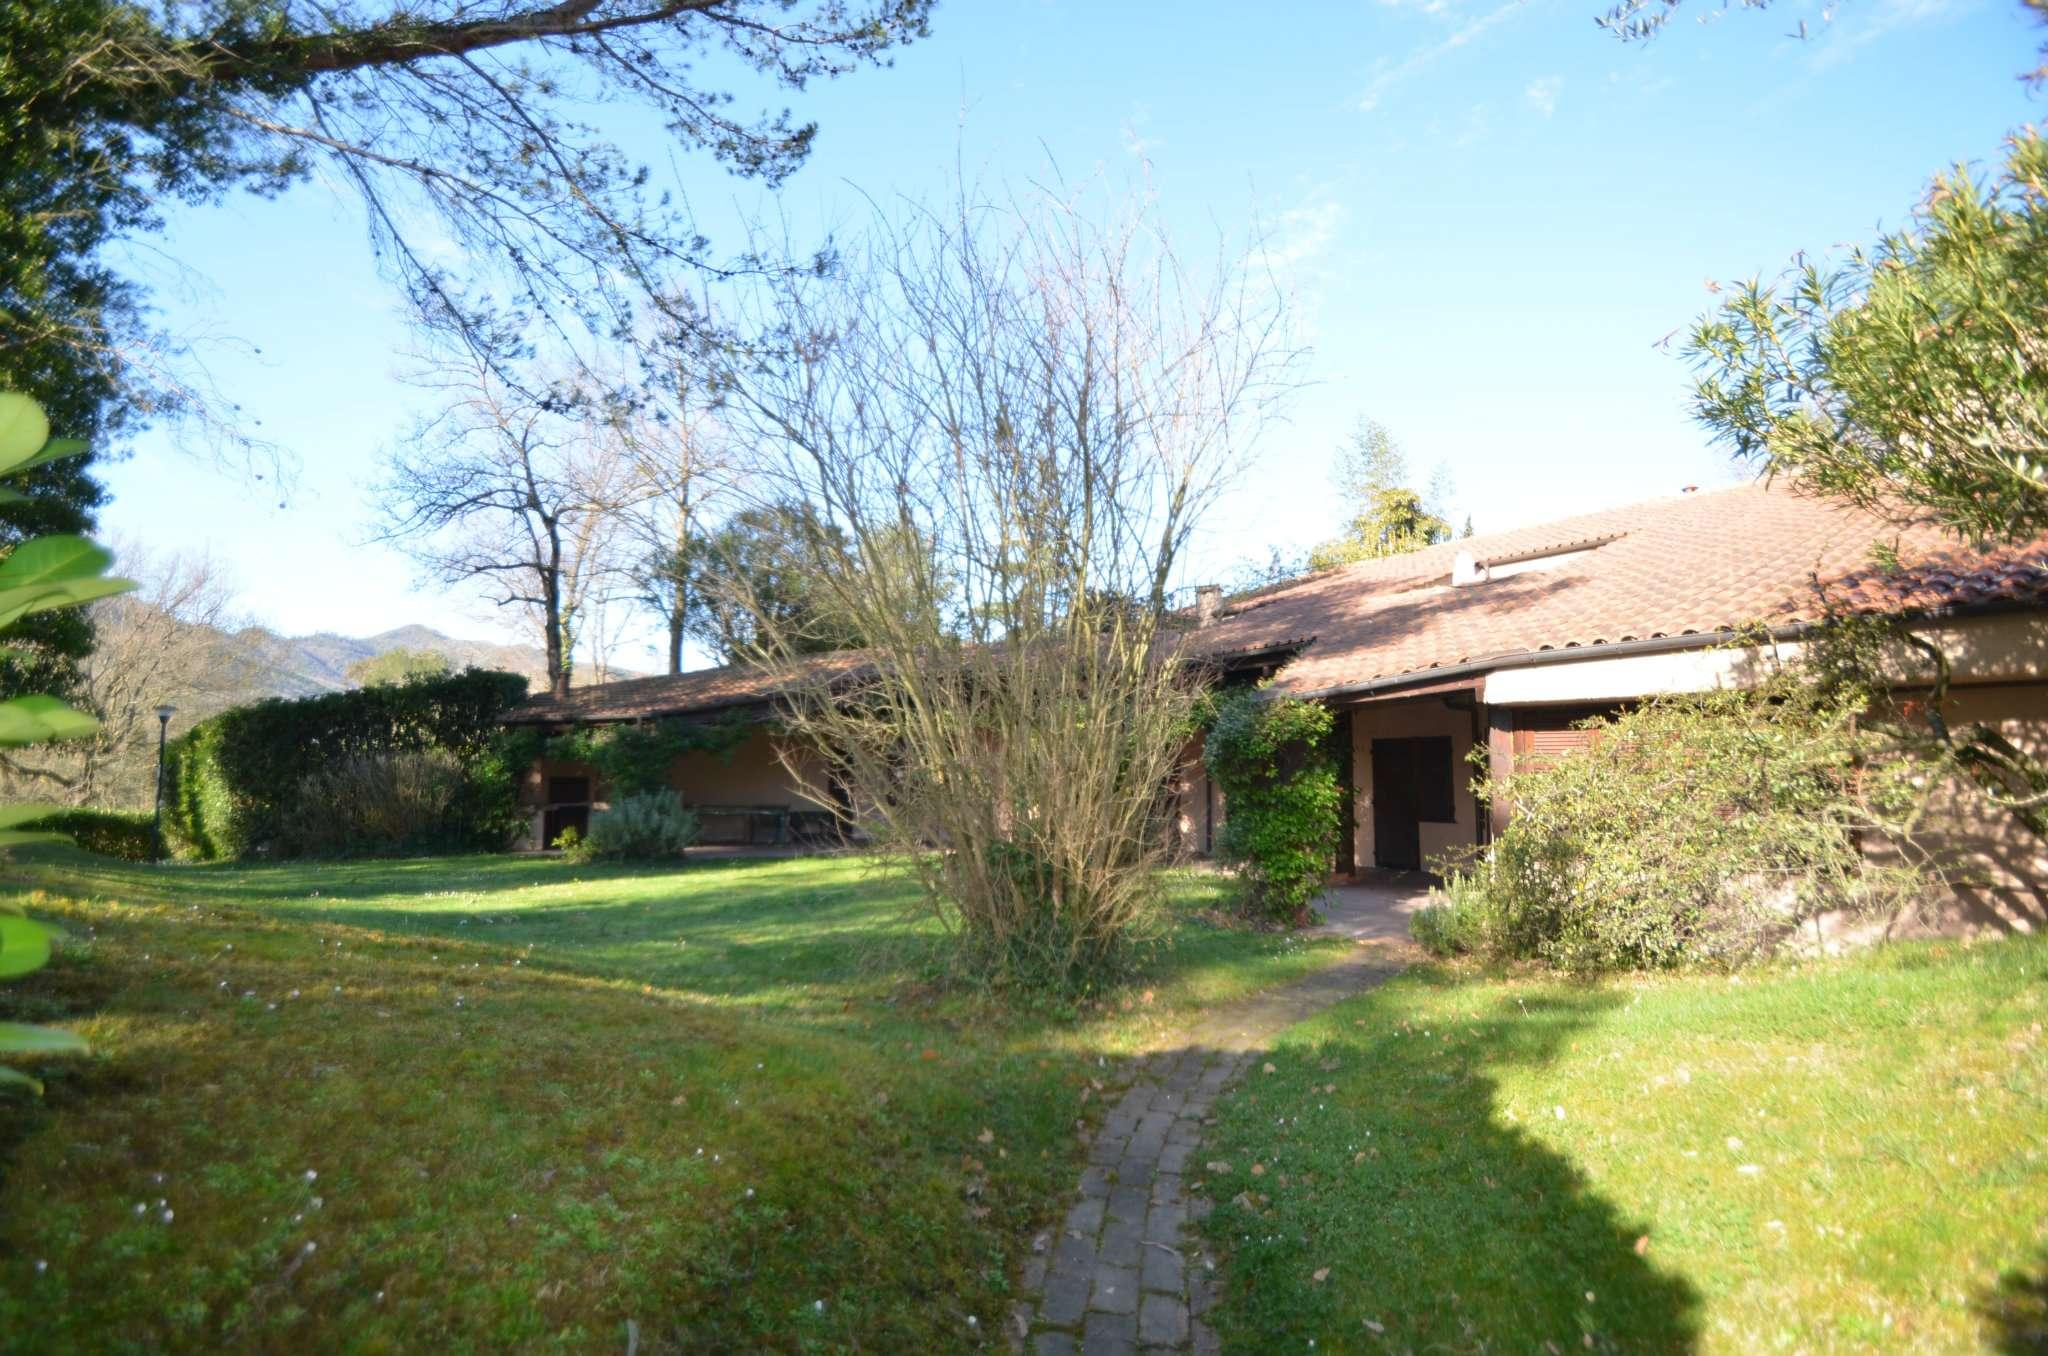 Golf Garlenda , fronte buca 1, bell ' appartamento con ampio giardino.